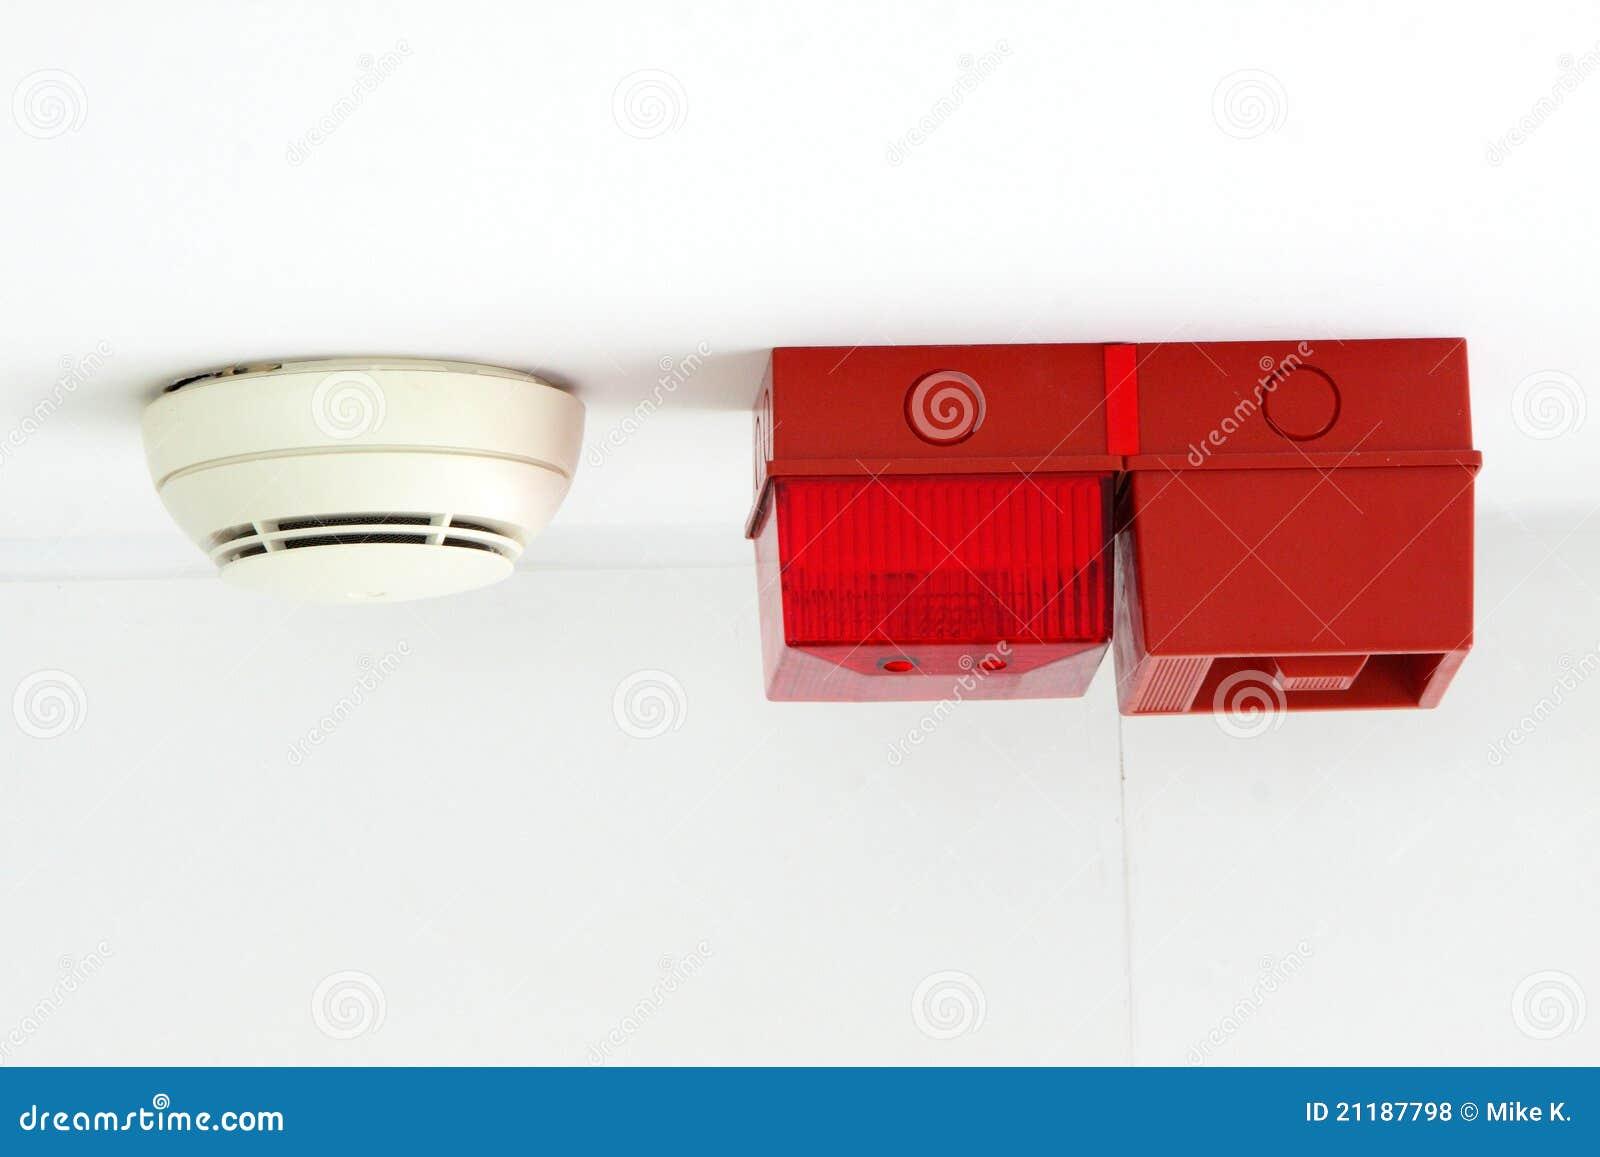 Fire Alarm & Smoke Detector